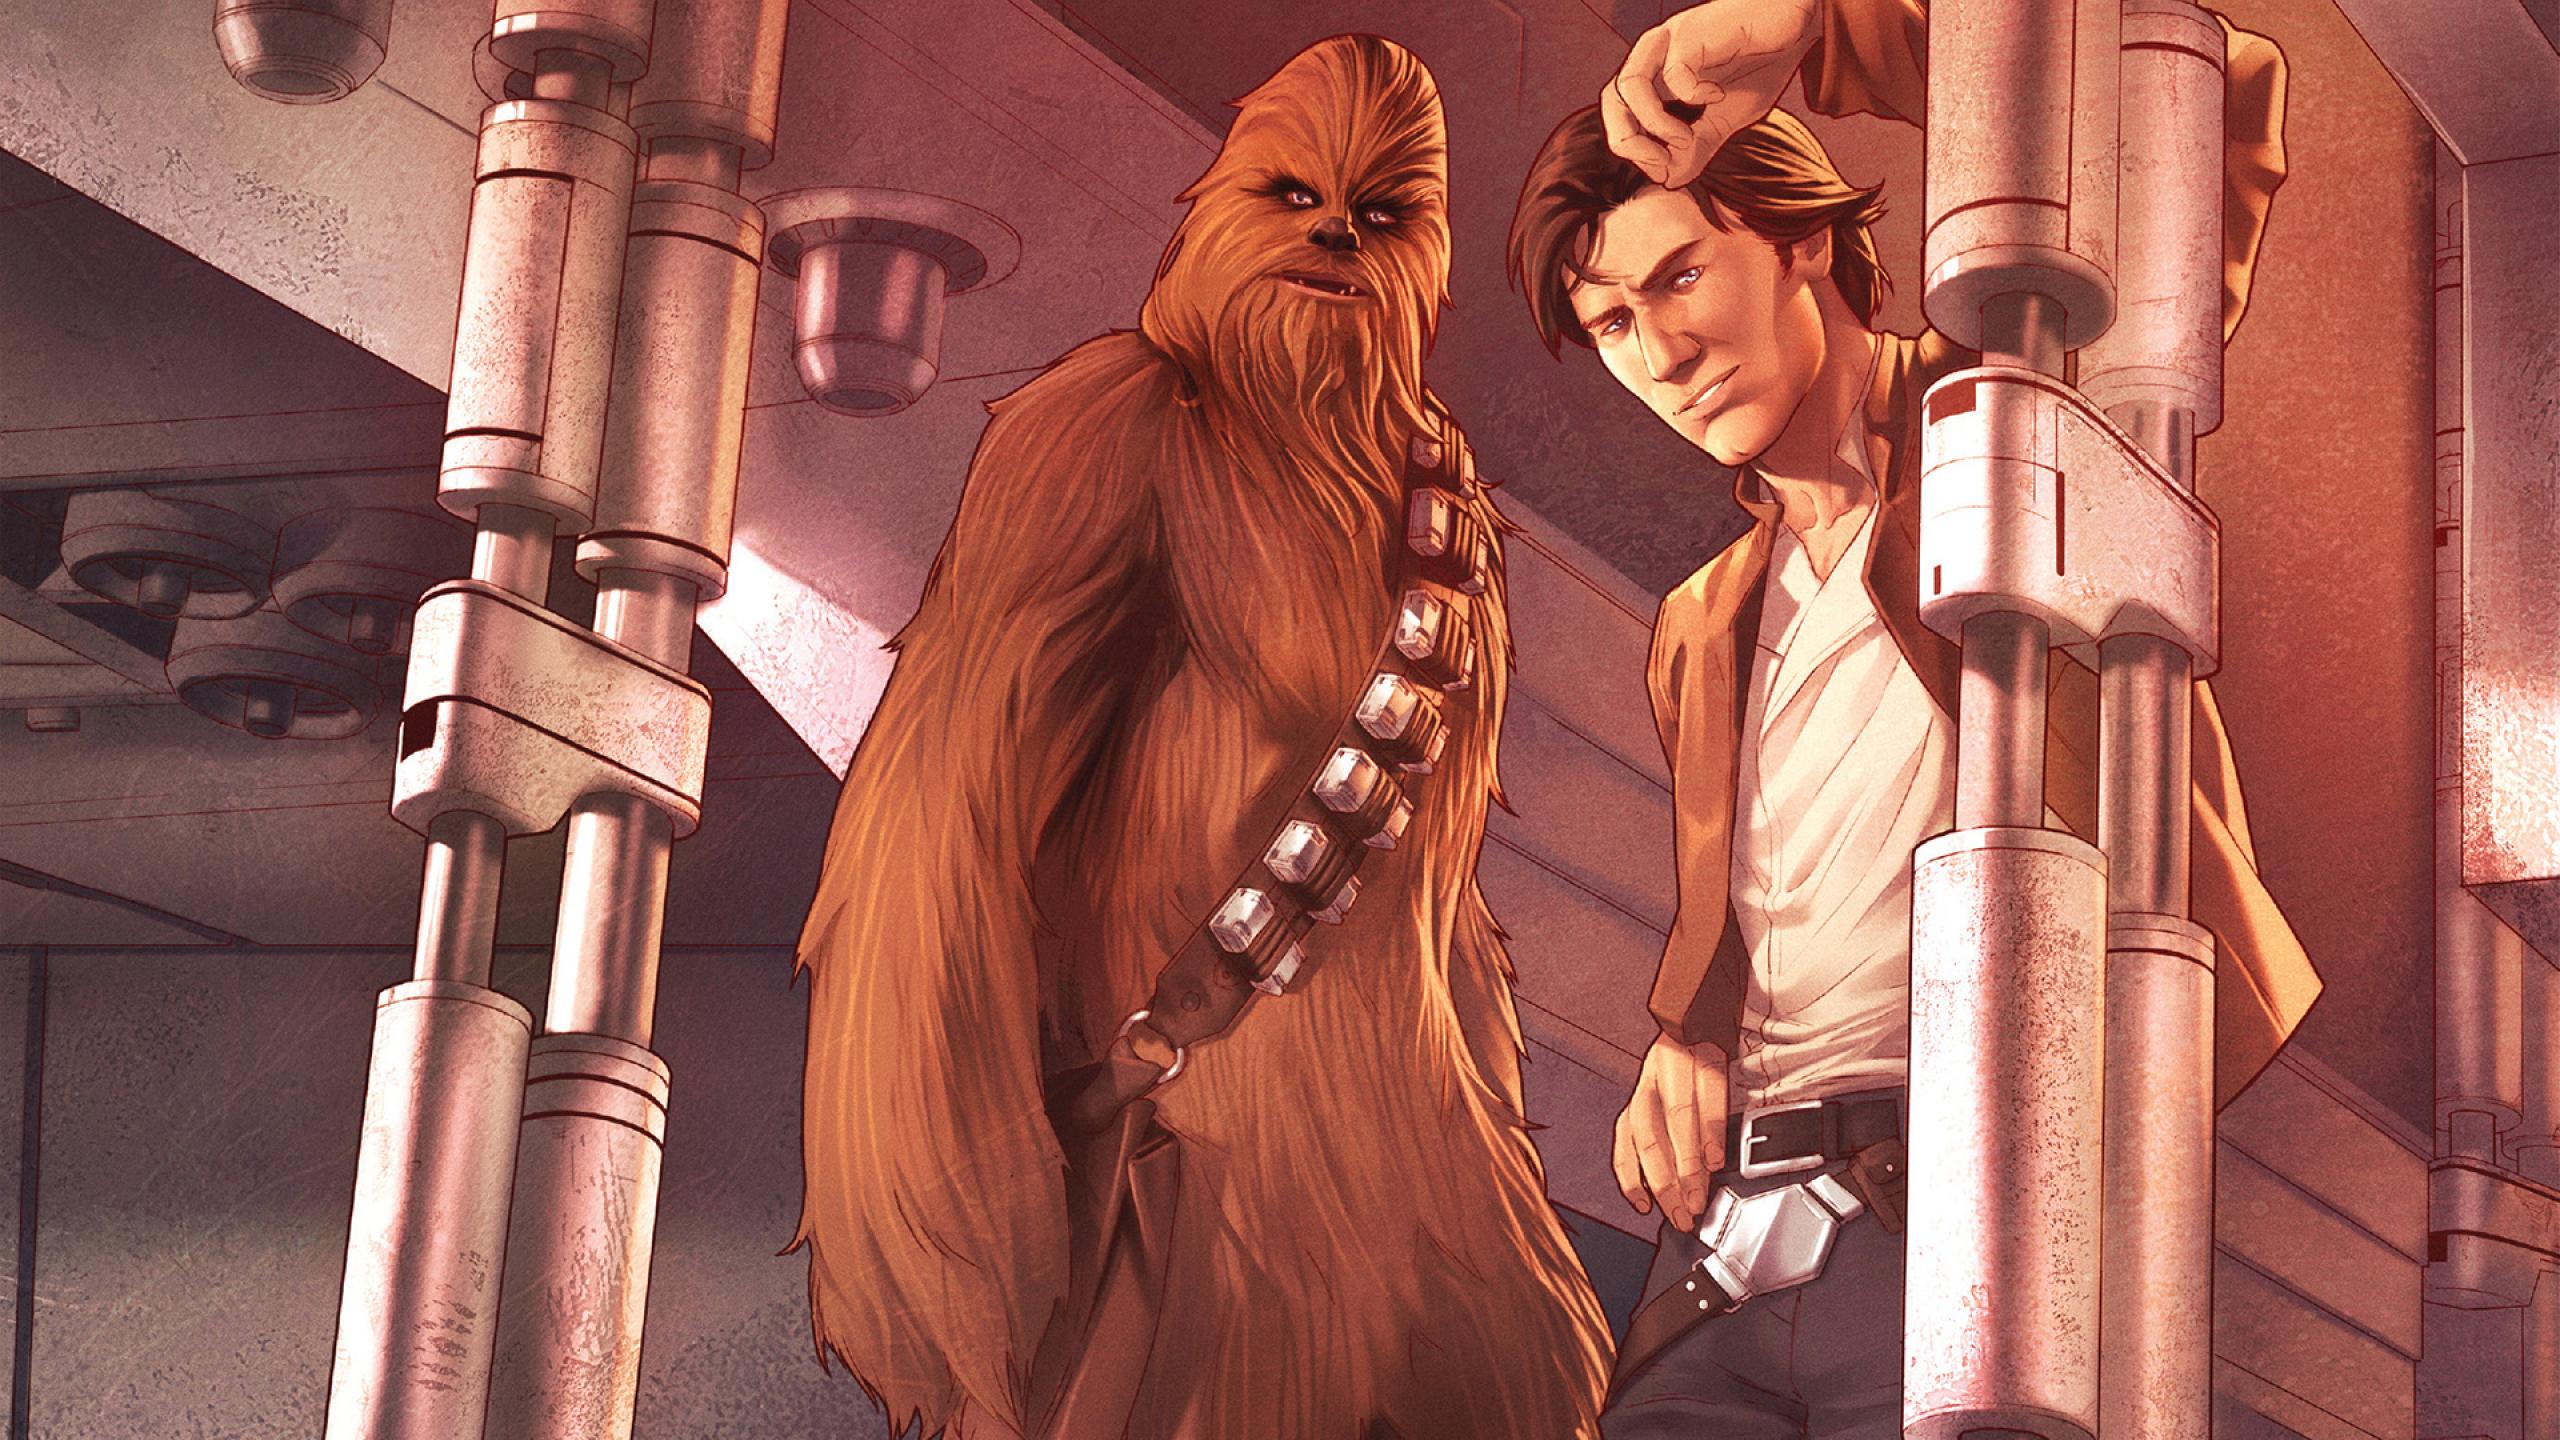 Star Wars Han Solo And Chewbacca Full Hd Wallpaper